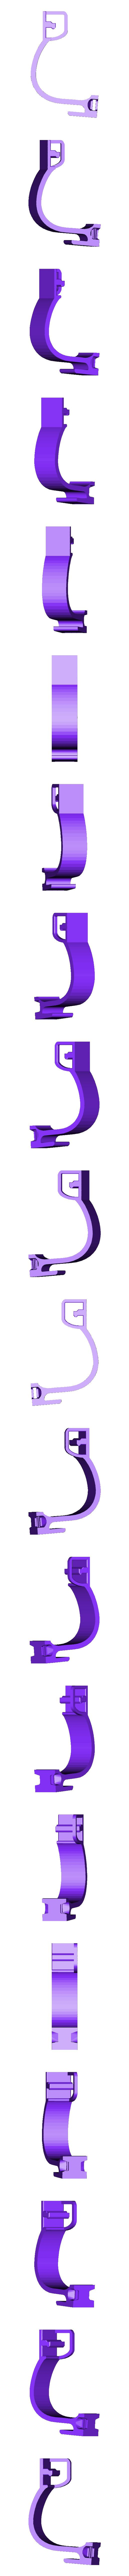 Mavicipad_right.stl Download free STL file DJI Mavic Ipad bracket with Combo strap snaps • 3D printing template, MatsErik